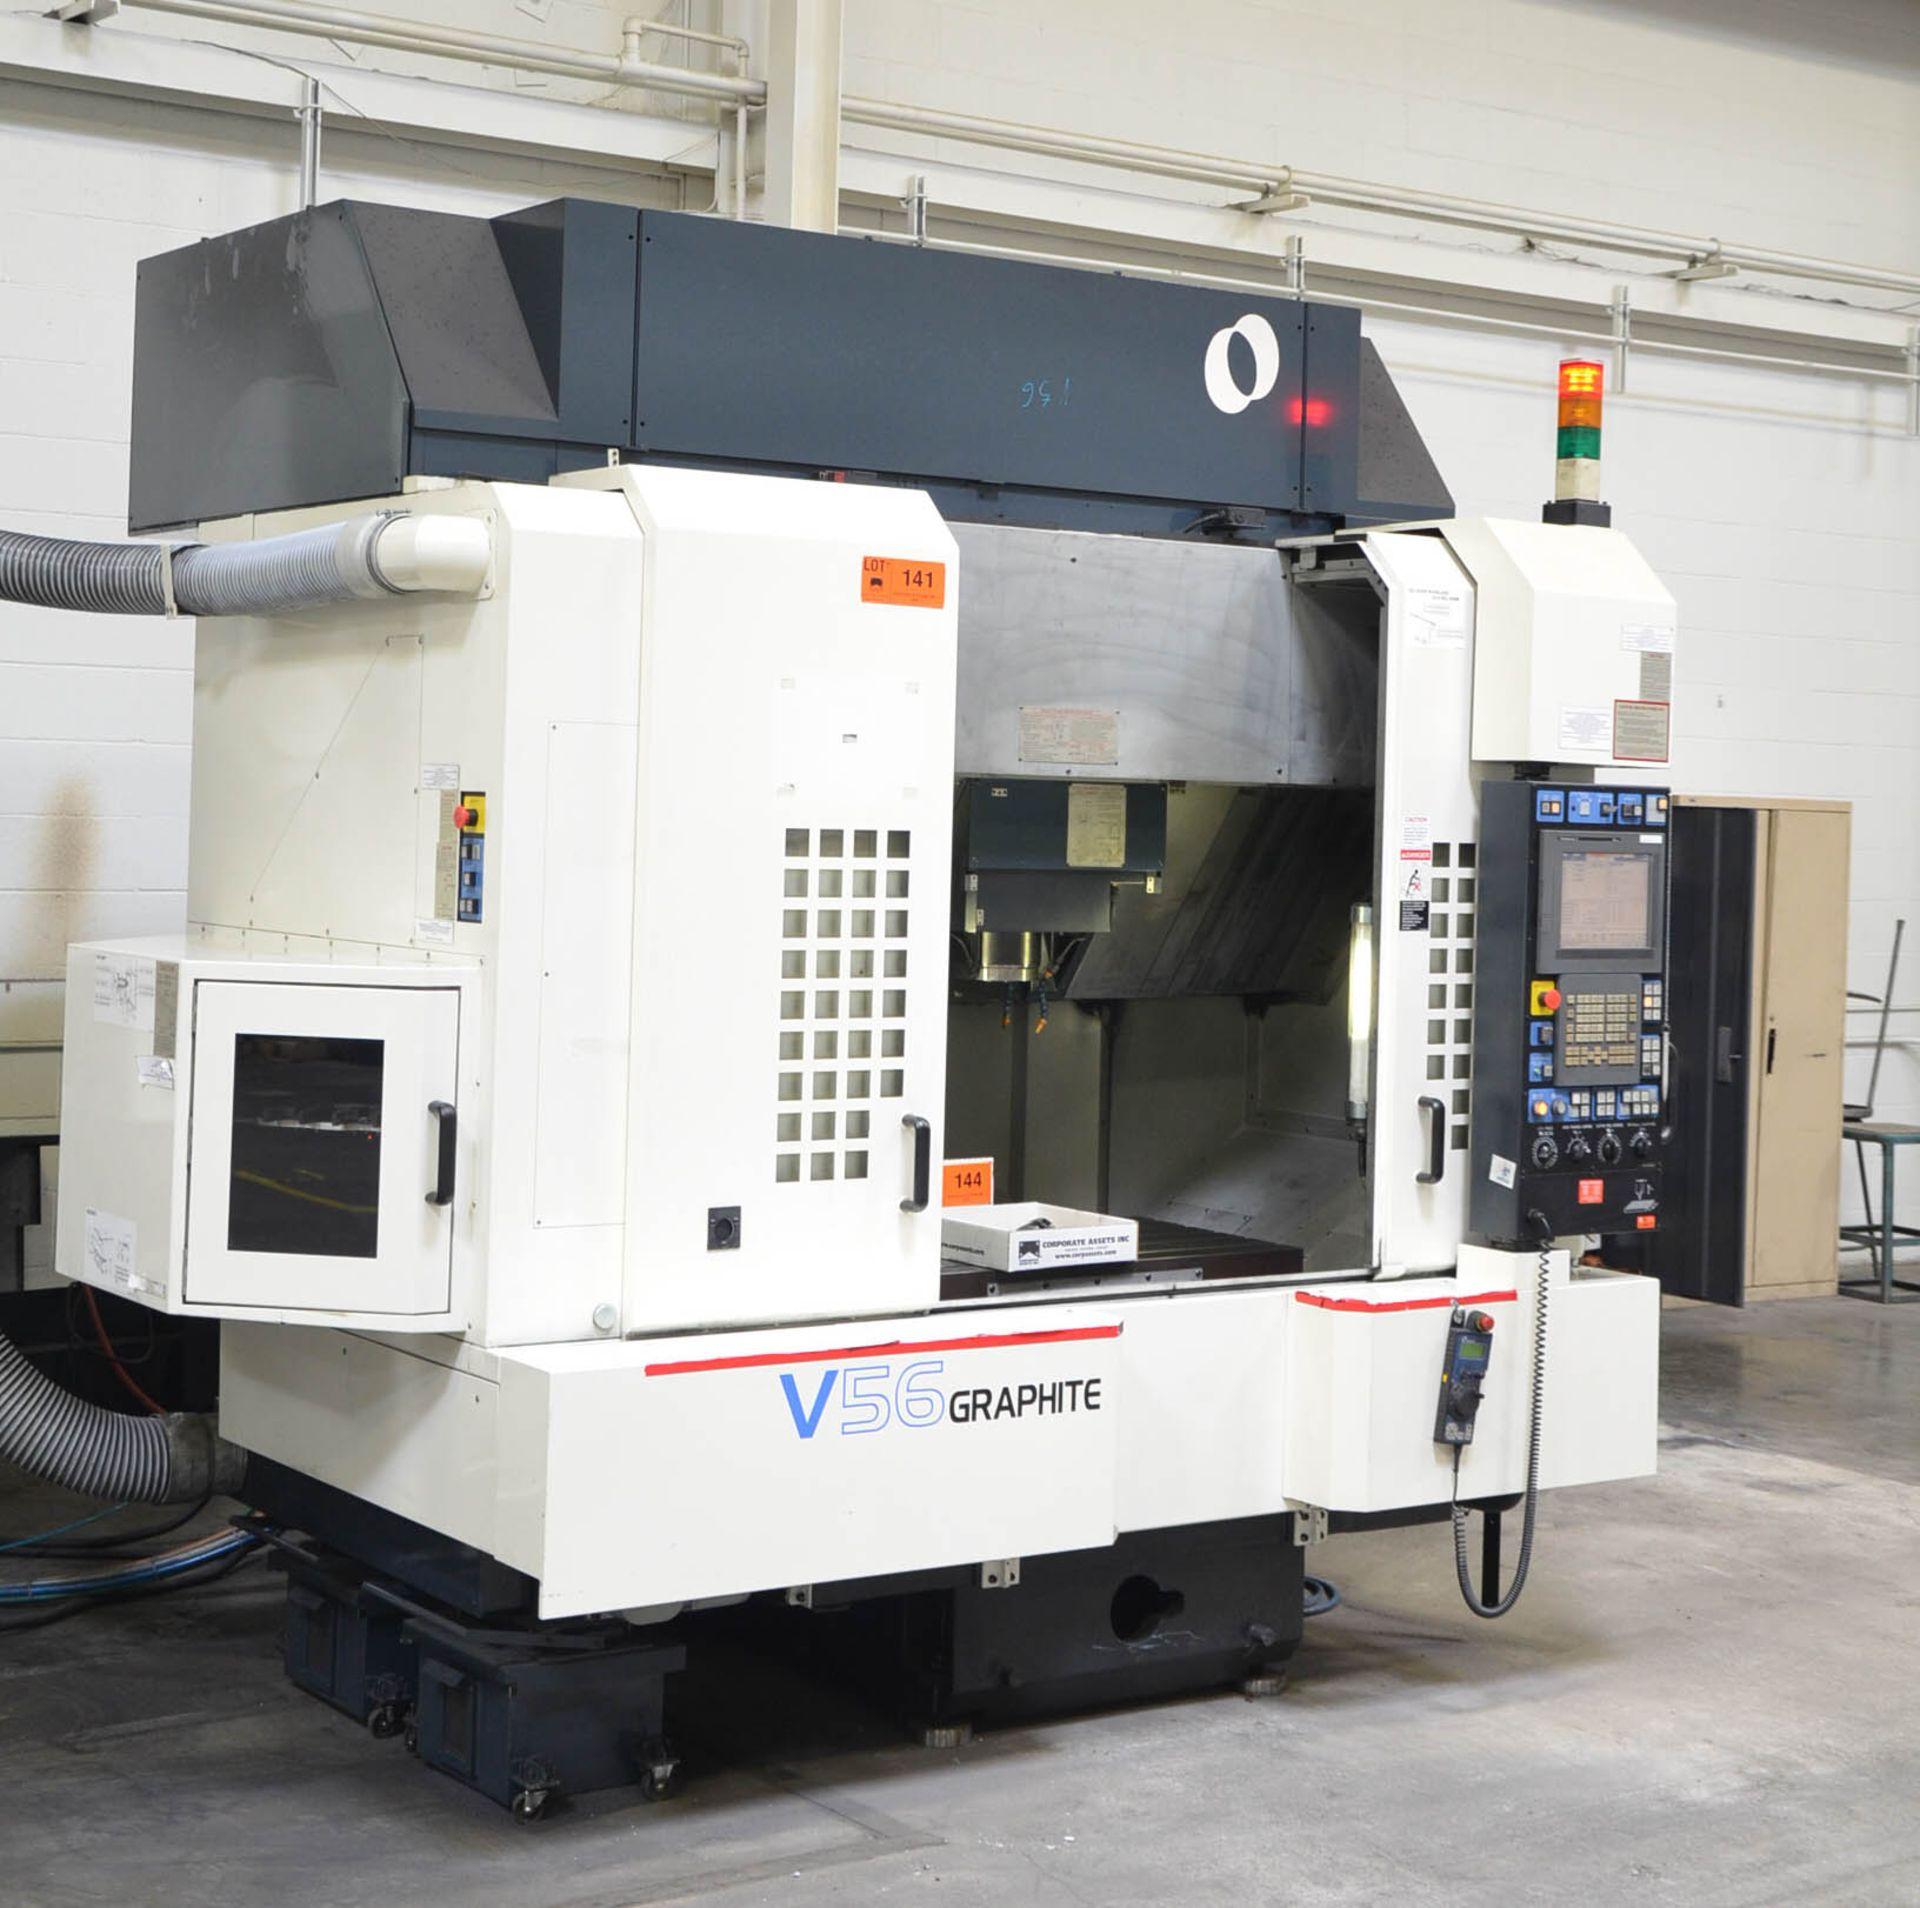 MAKINO (2008) V56 GRAPHITE CNC VERTICAL MACHINING CENTER WITH MAKINO PROFESSIONAL 5 TOUCHSCREEN - Image 2 of 10